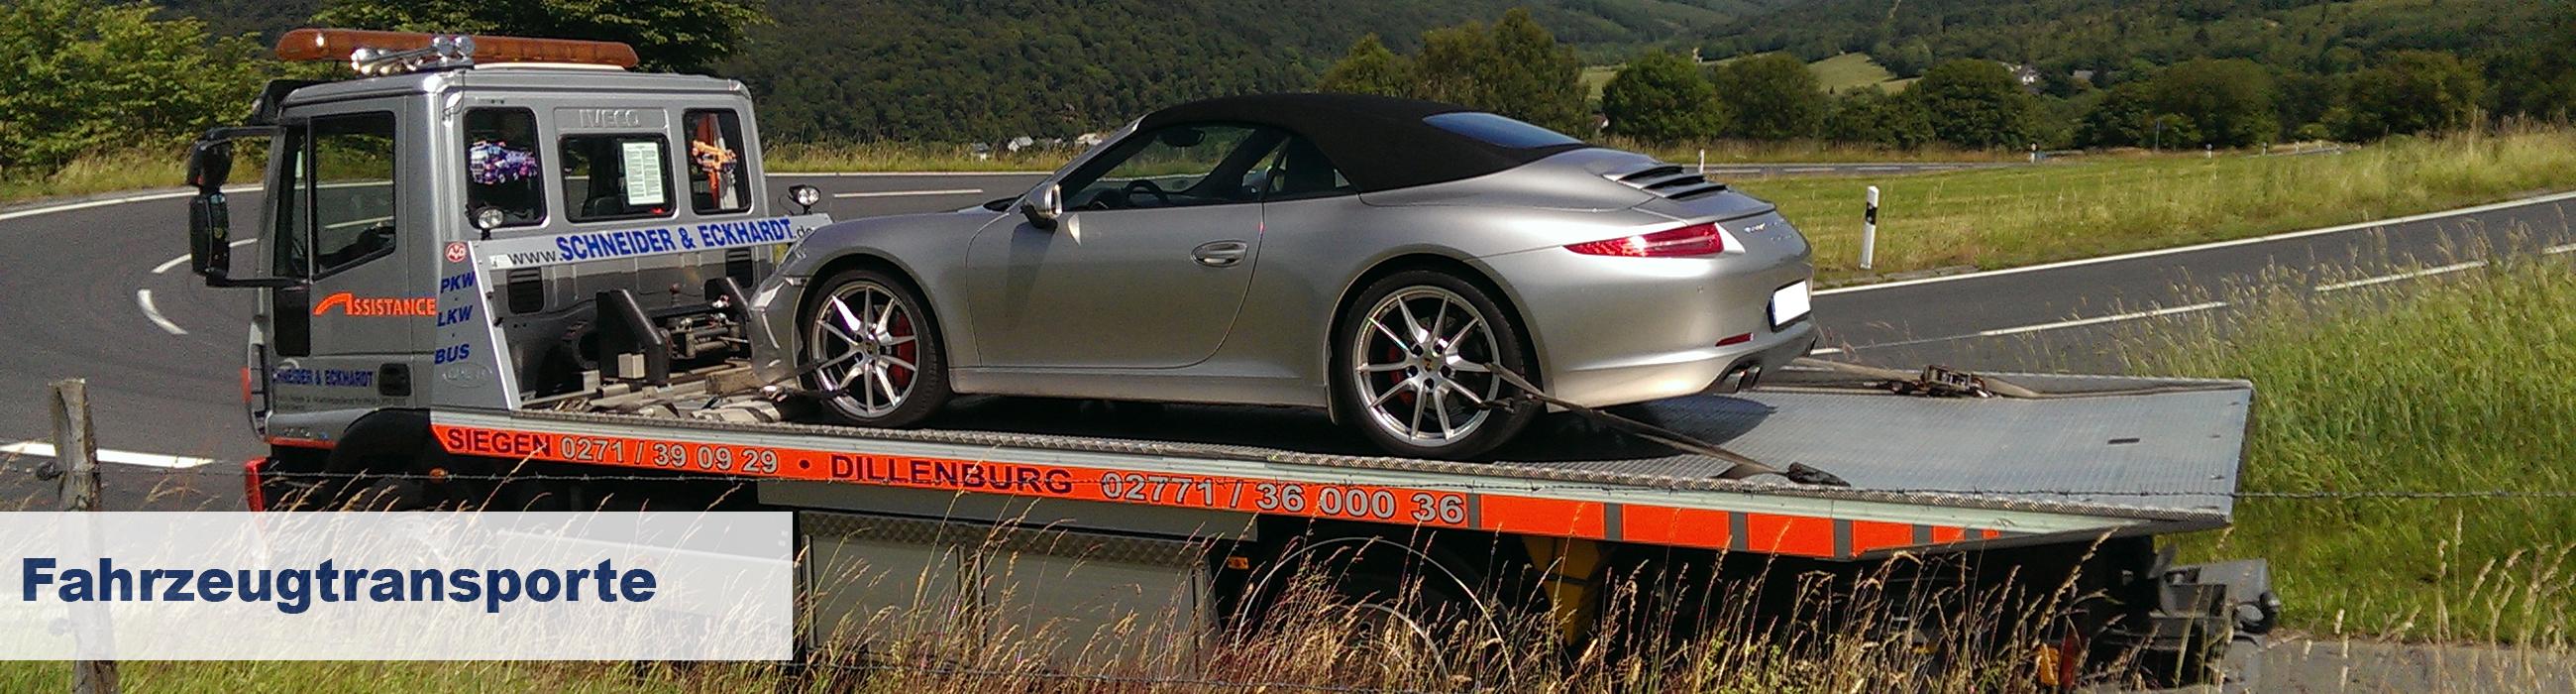 Fahrzeugtransporte - ob alt oder neu!